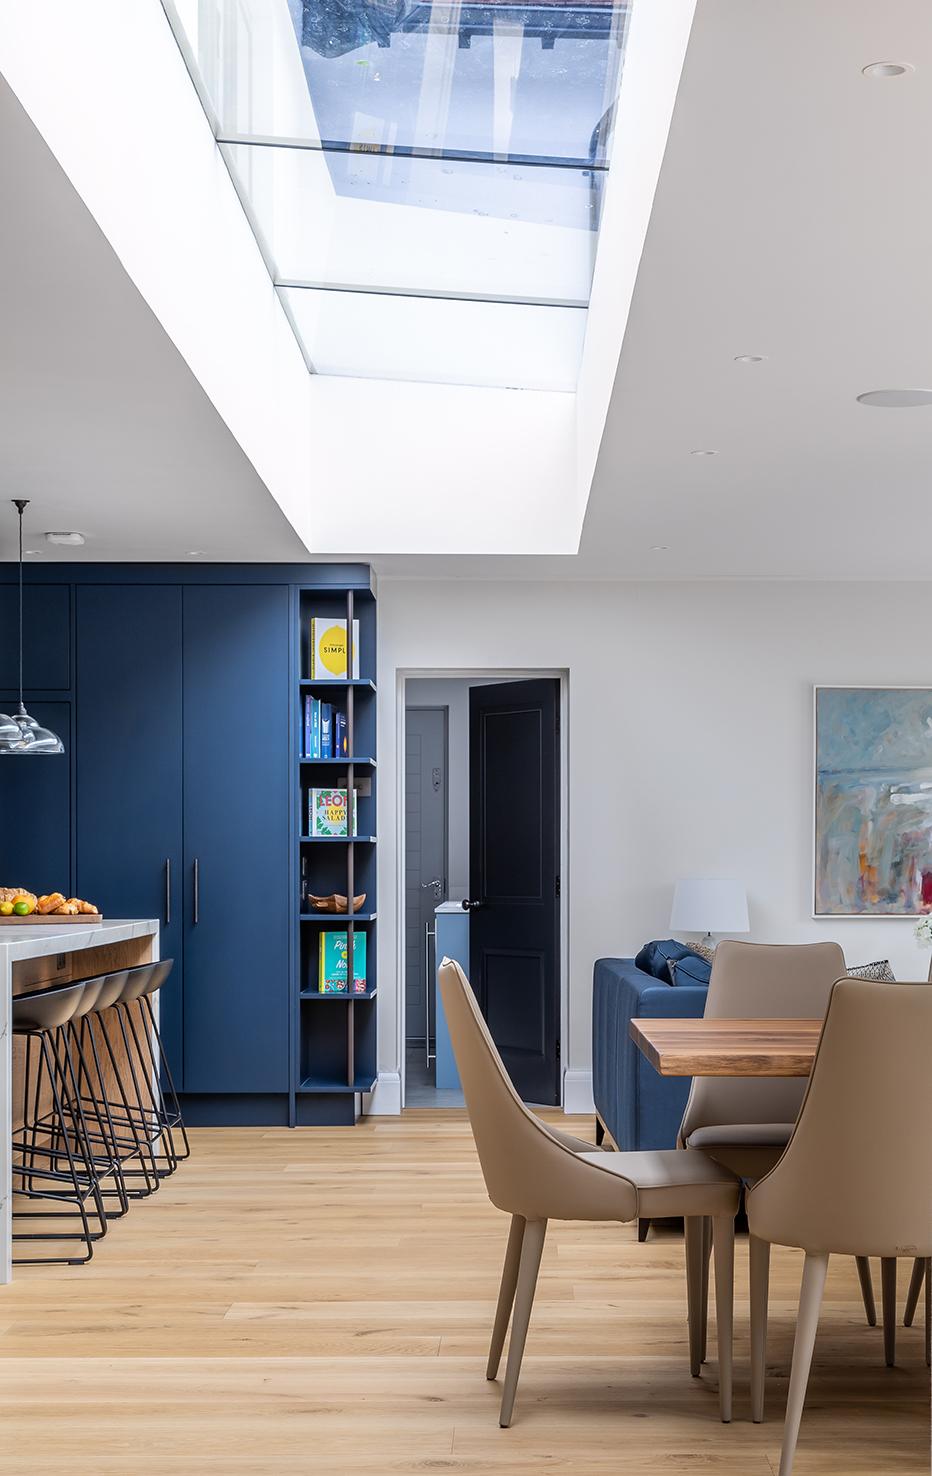 Chilterns-Hill-SL320-Rooflight-Fixed-Window_6